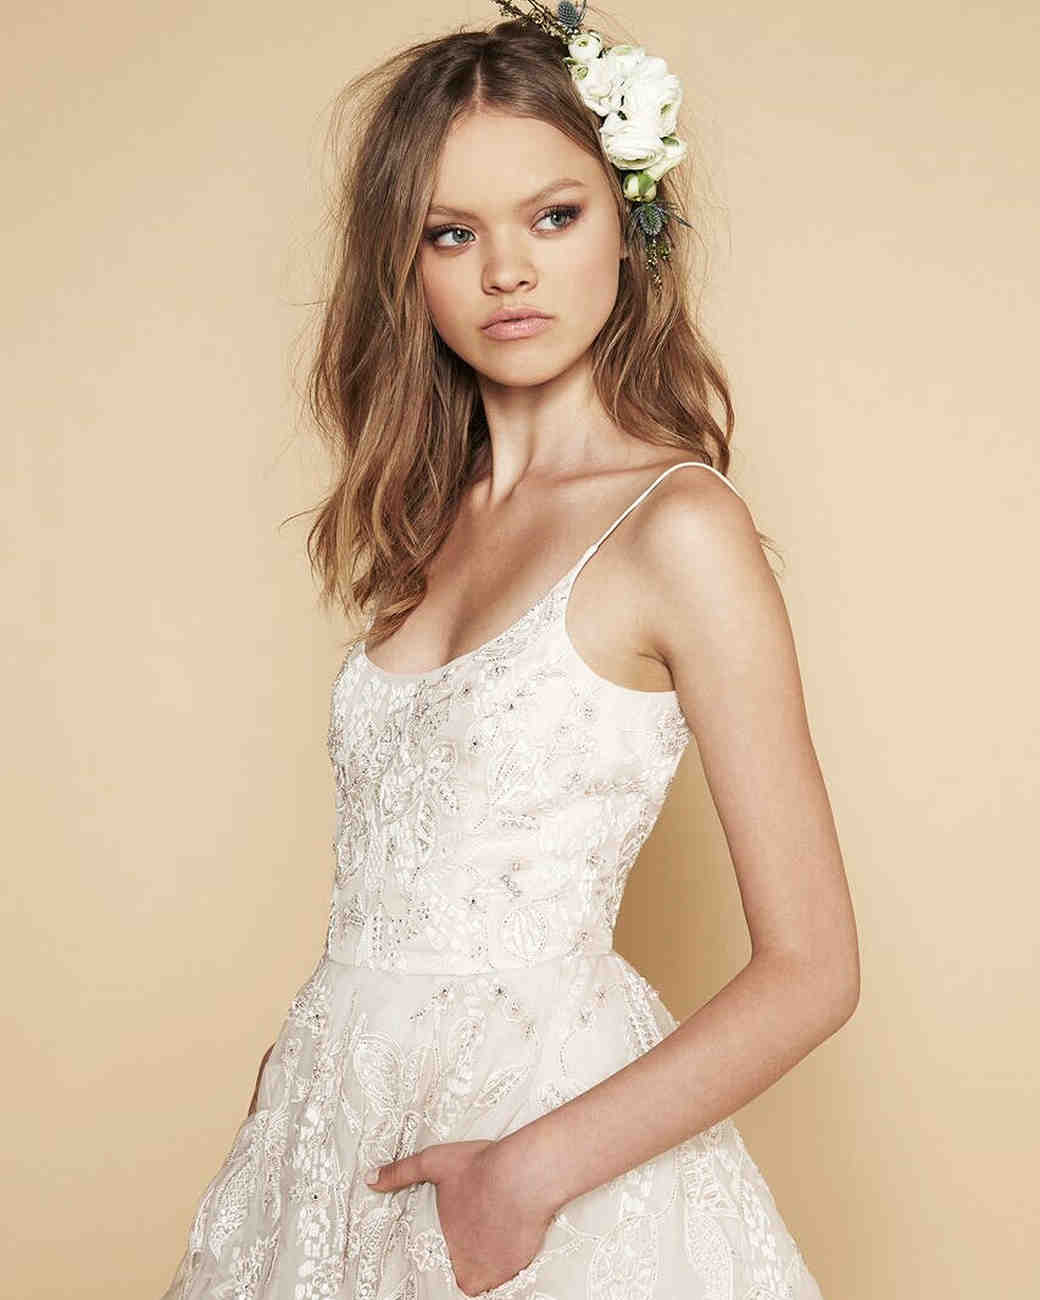 sabrina-dahan-dress-with-pockets-ellie.jpg